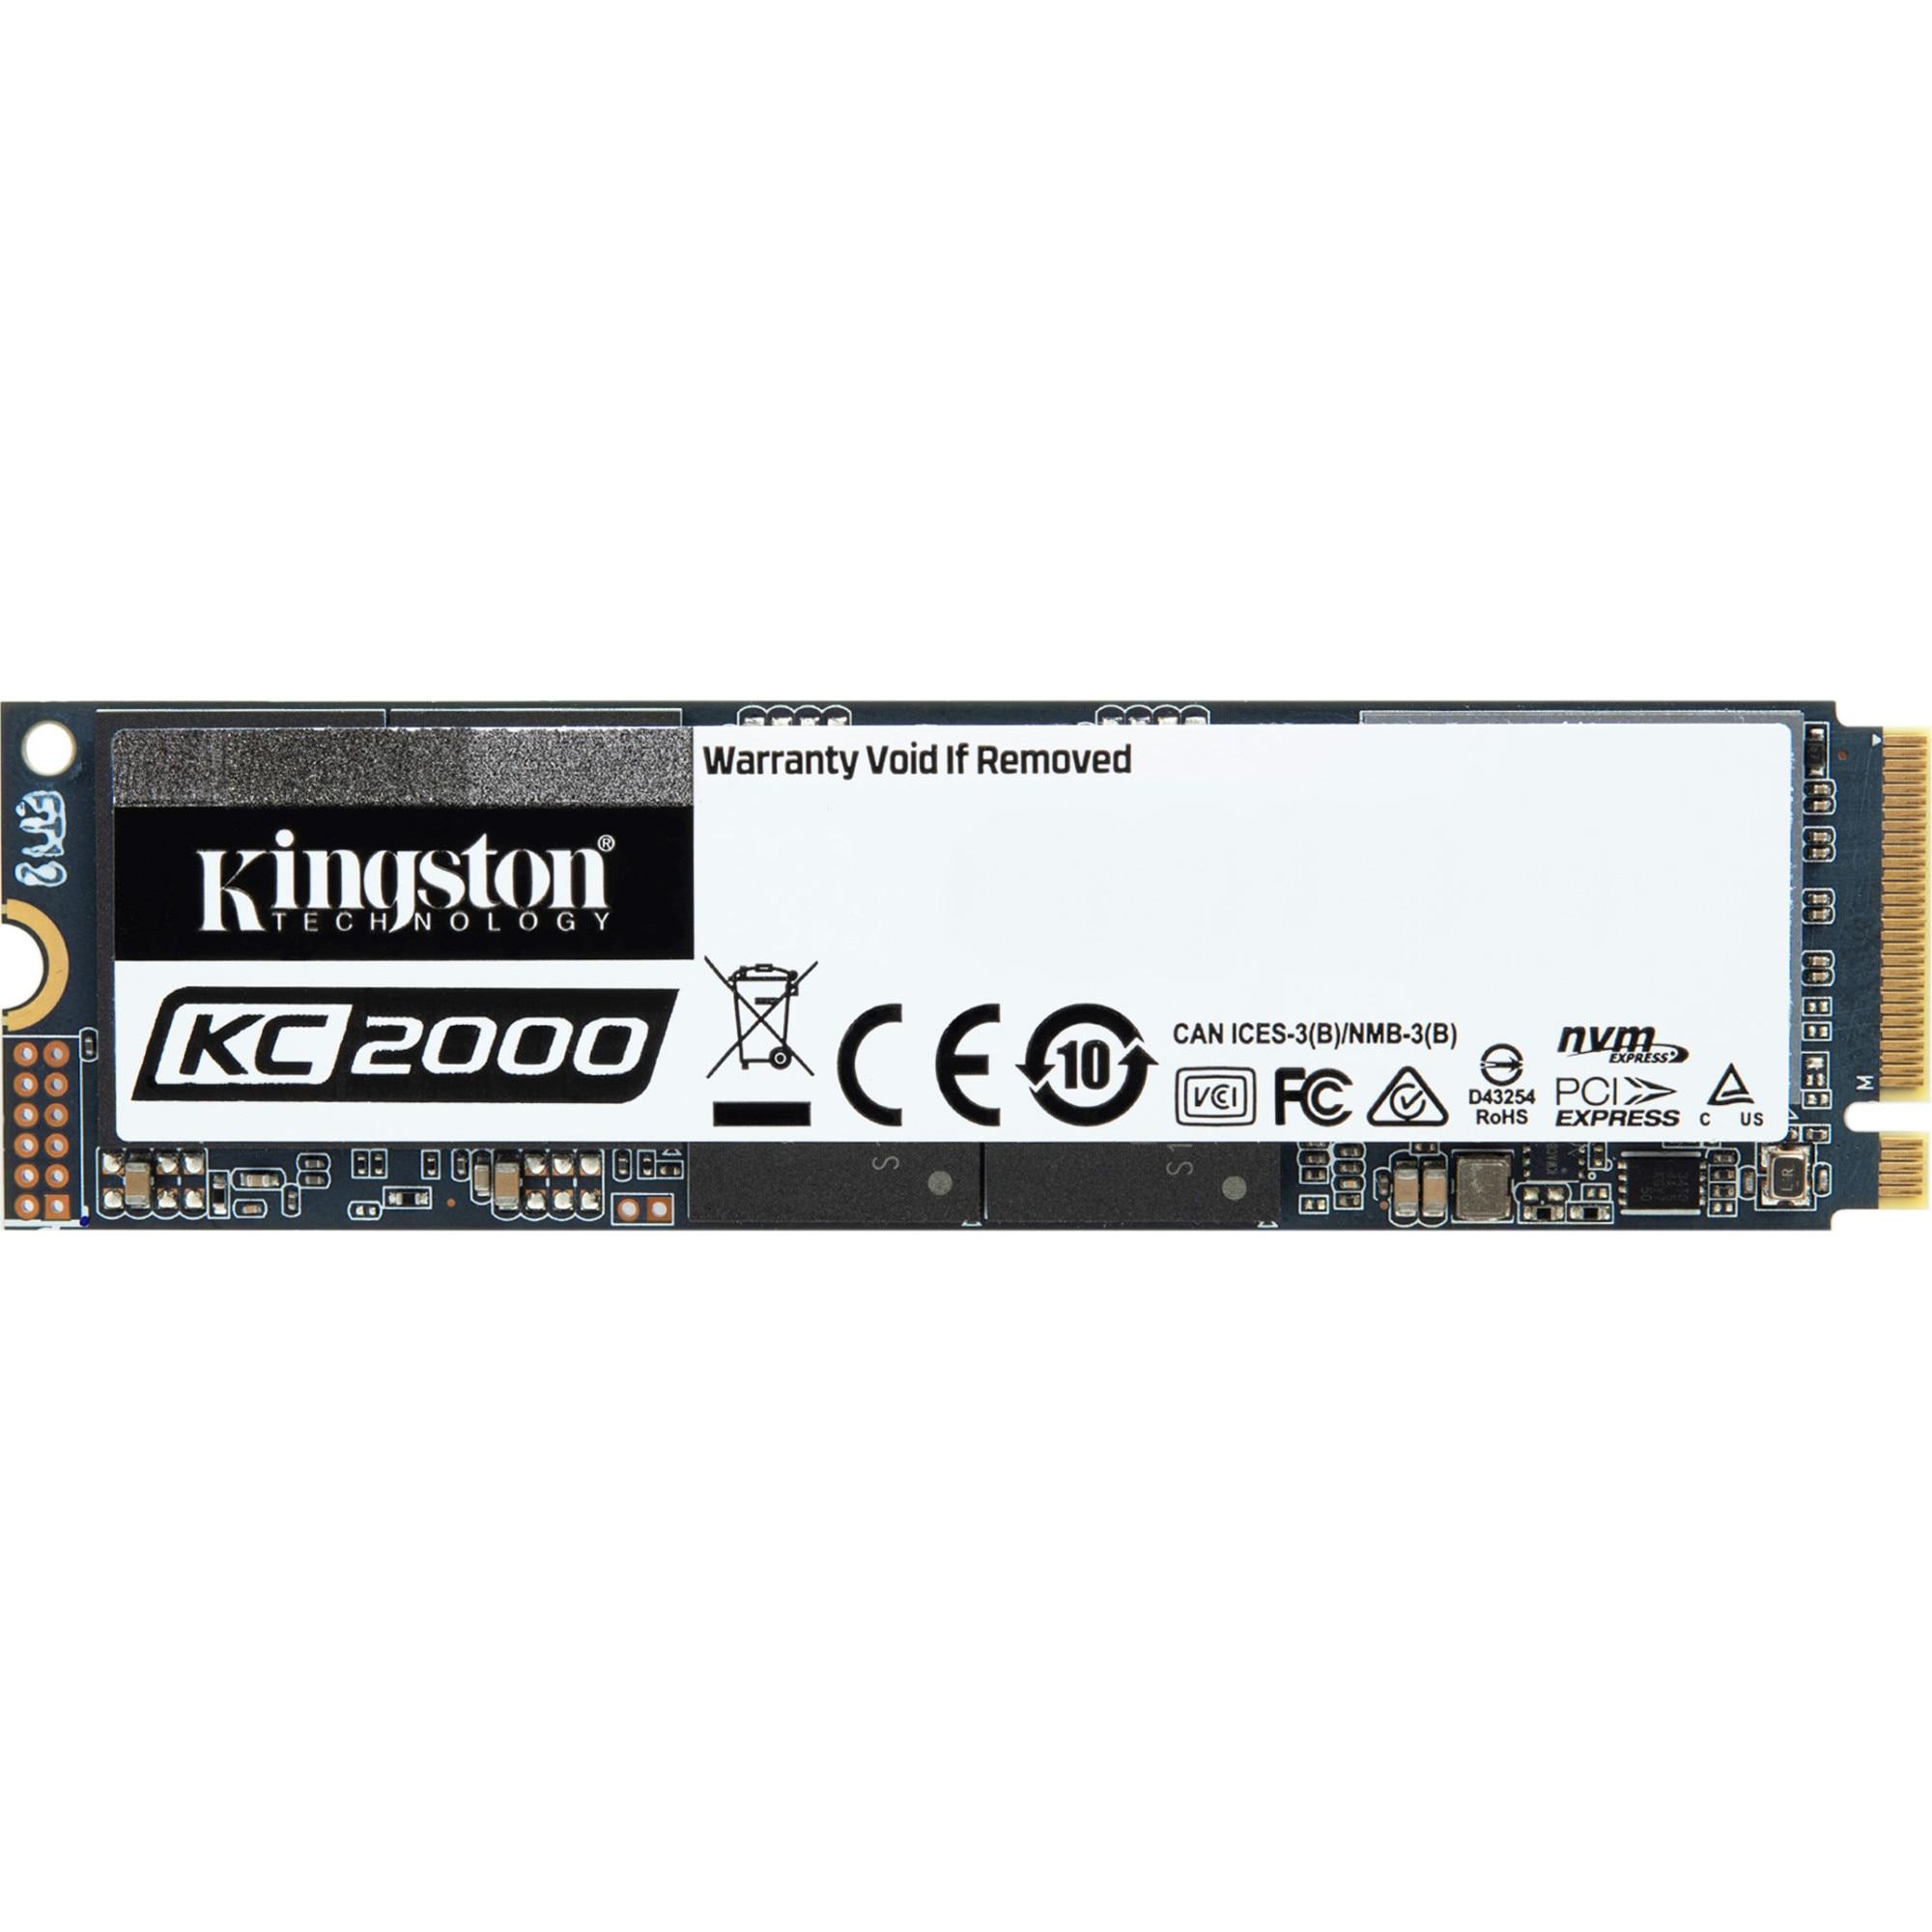 Fotografie Solid-state drive (SSD) Kingston KC2000, 1TB, M.2, NVMe